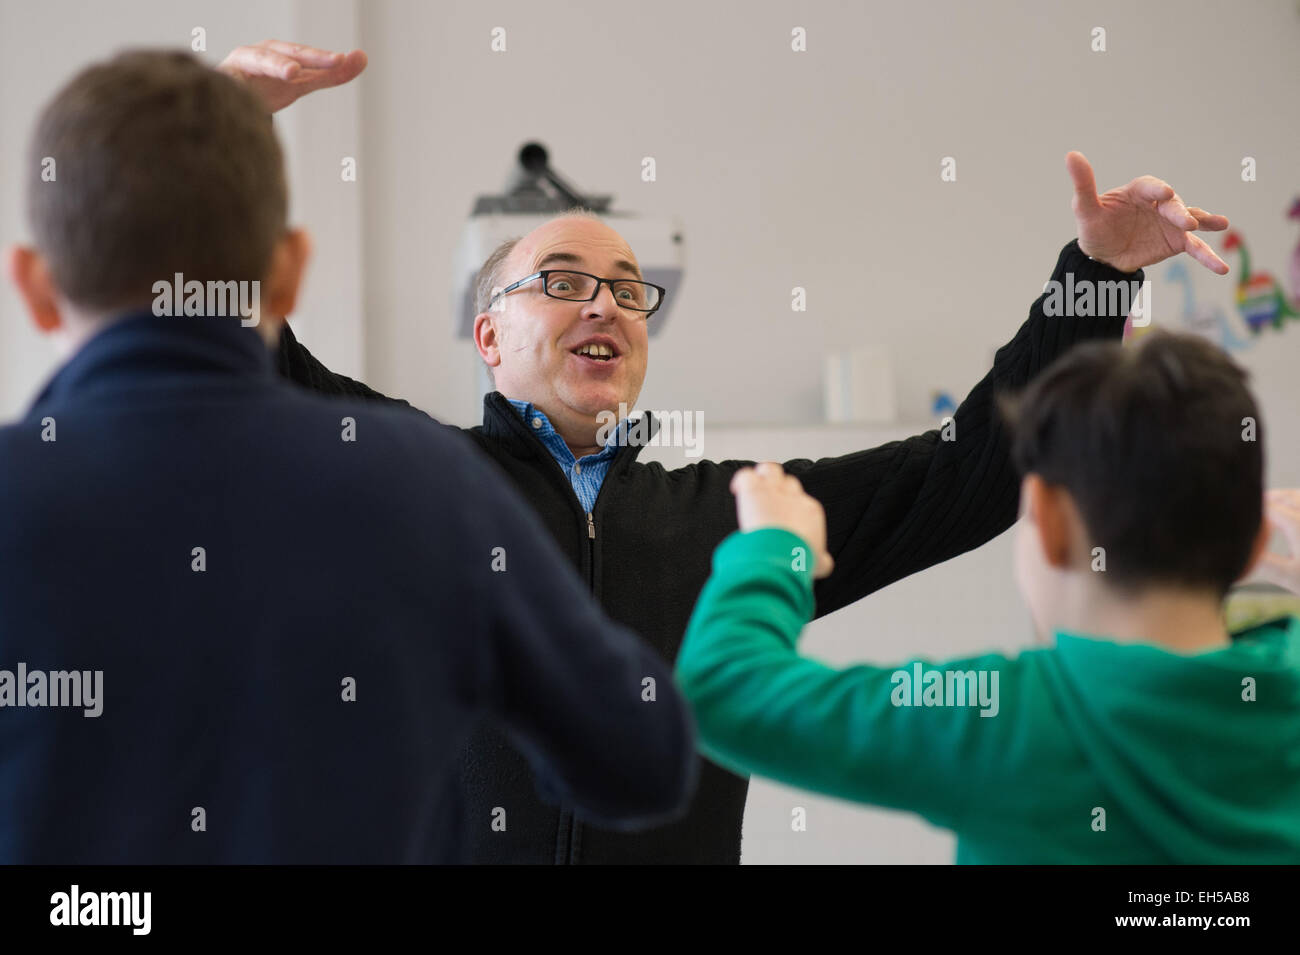 Regensburg, Germany. 5th Mar, 2015. Magnus Gaul, head of the professorship for music pedagogy at Regensburg University - Stock Image